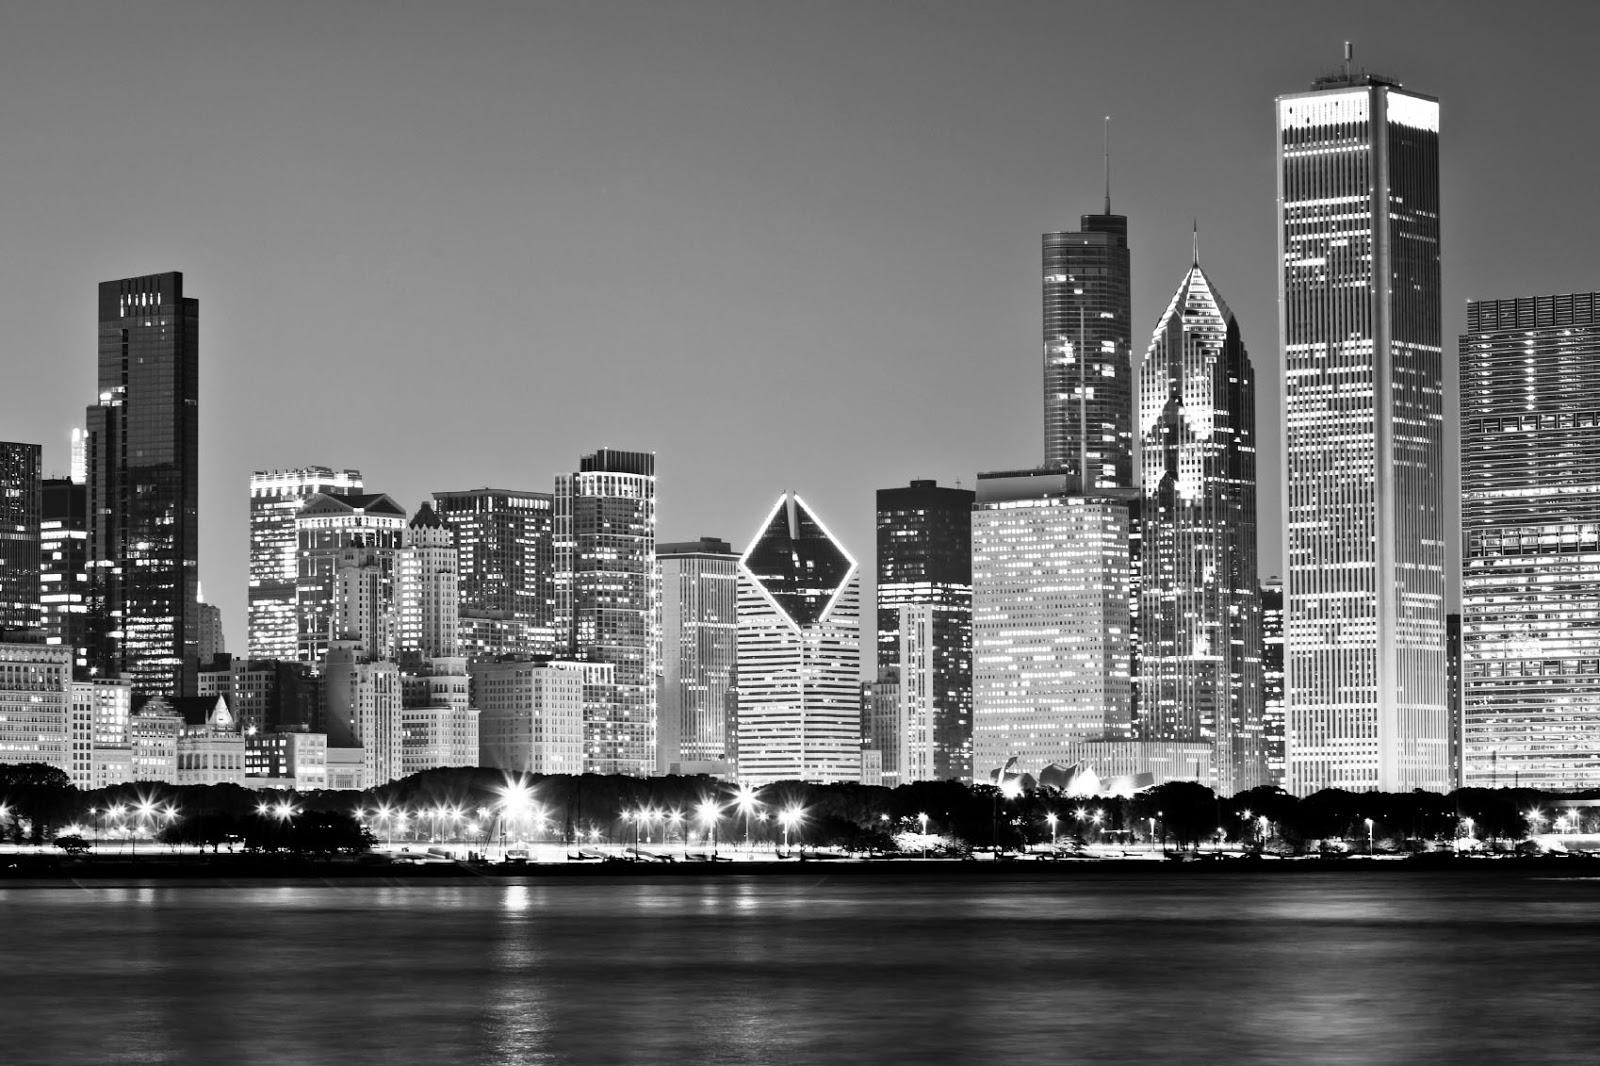 Chicago Skyline With Trump